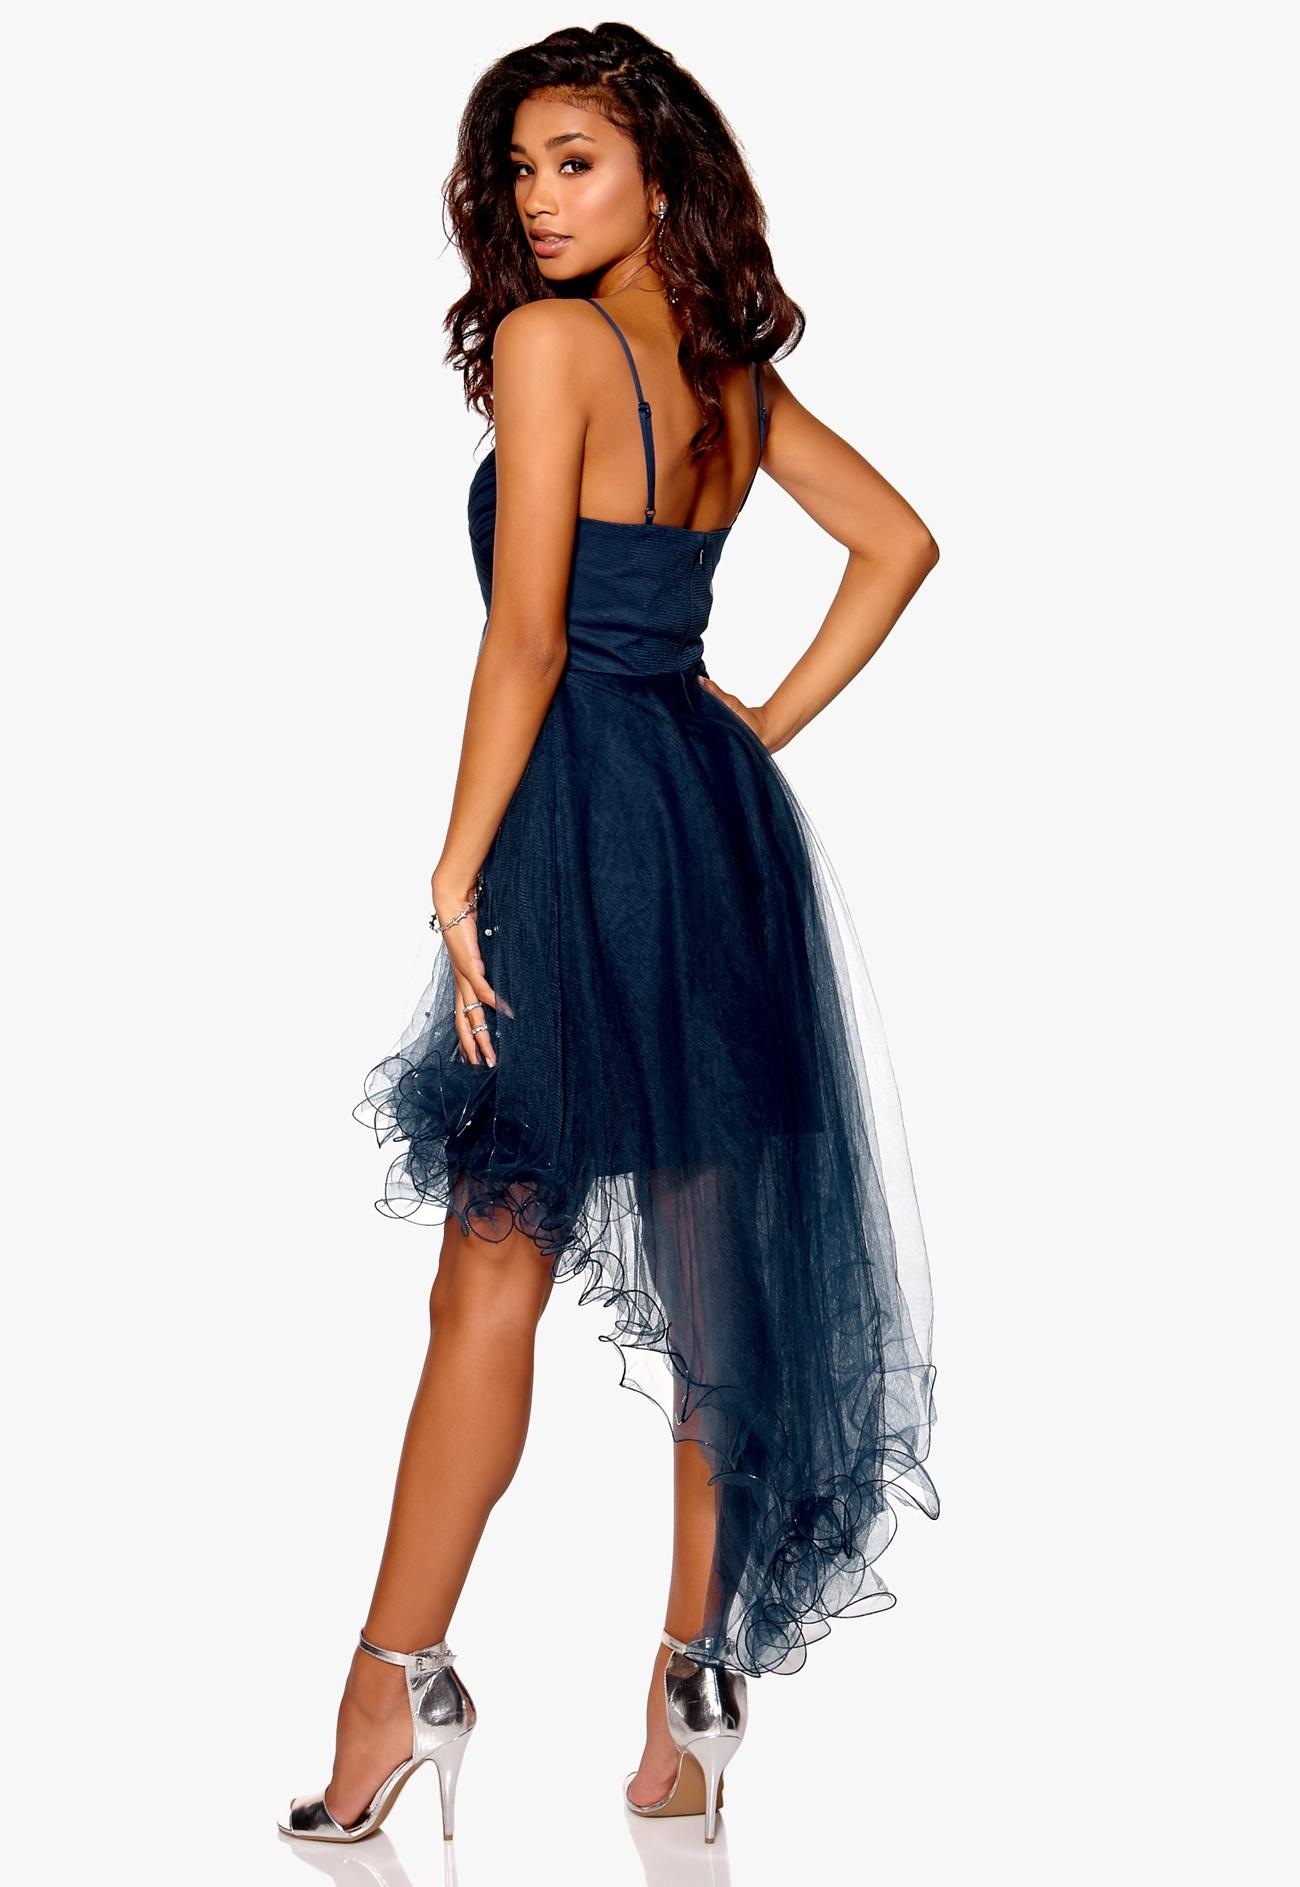 Model behaviour johanna dress midnight blue bubbleroom - Modele dressing ...